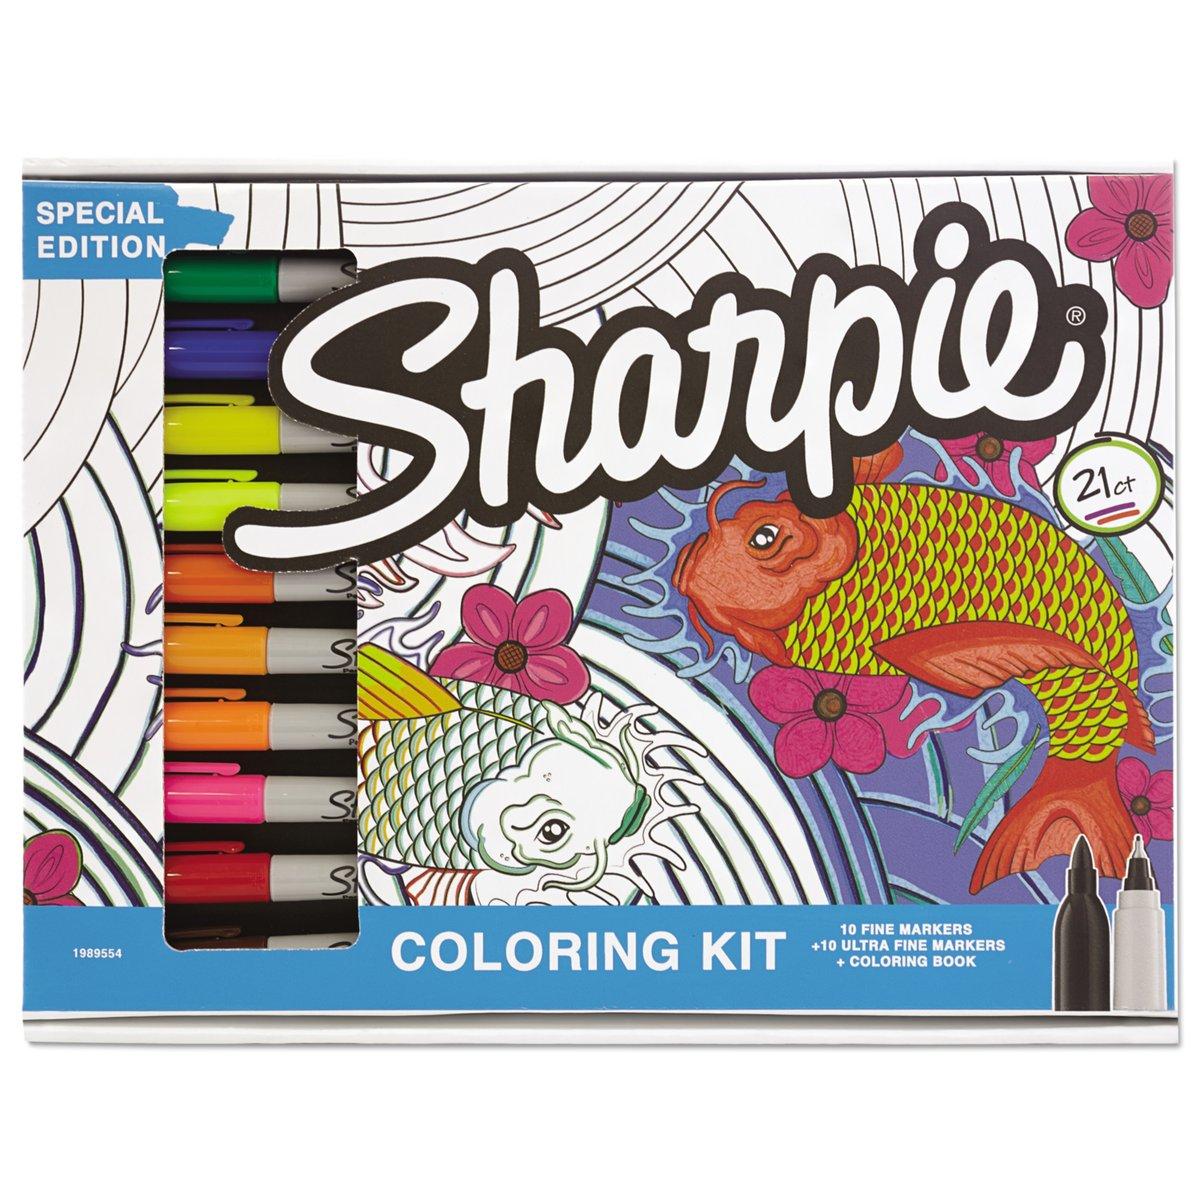 80% Off!!  Sharpie Deep Sea Color Collection Coloring Kit  https://goto.walmart.com/c/1952026/565706/9383?veh=aff&sourceid=imp_000011112222333344&u=https%3A%2F%2Fwww.walmart.com%2Fip%2FSharpie-Deep-Sea-Color-Collection-Coloring-Kit%2F53720331…  #BwcDeals #dailydeals #DealsAndSteals #TEACHerspic.twitter.com/6zA716JMsZ